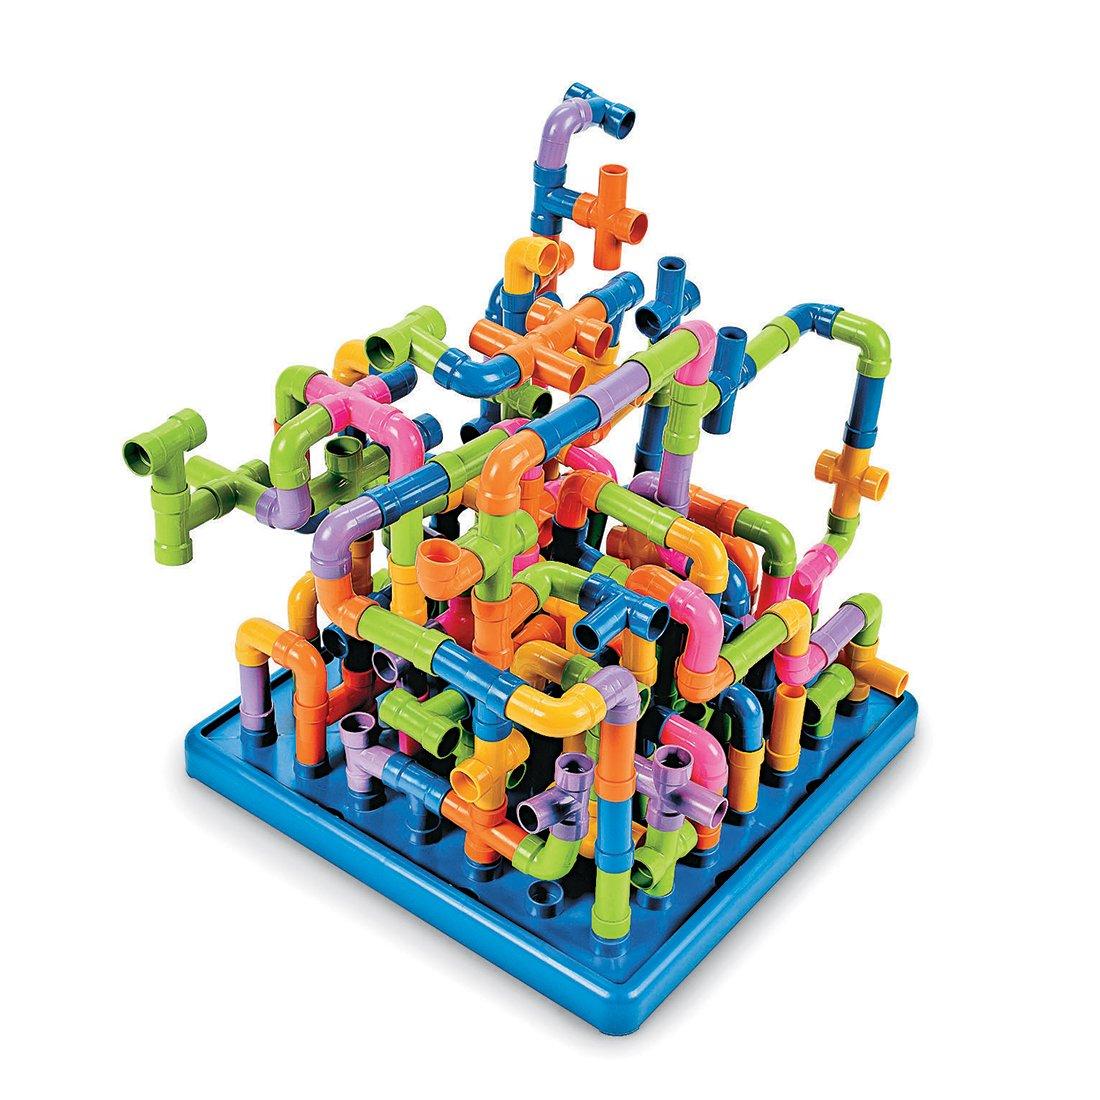 Jumbo Pipe Connector Set - Classroom School Supplies - From Fun365